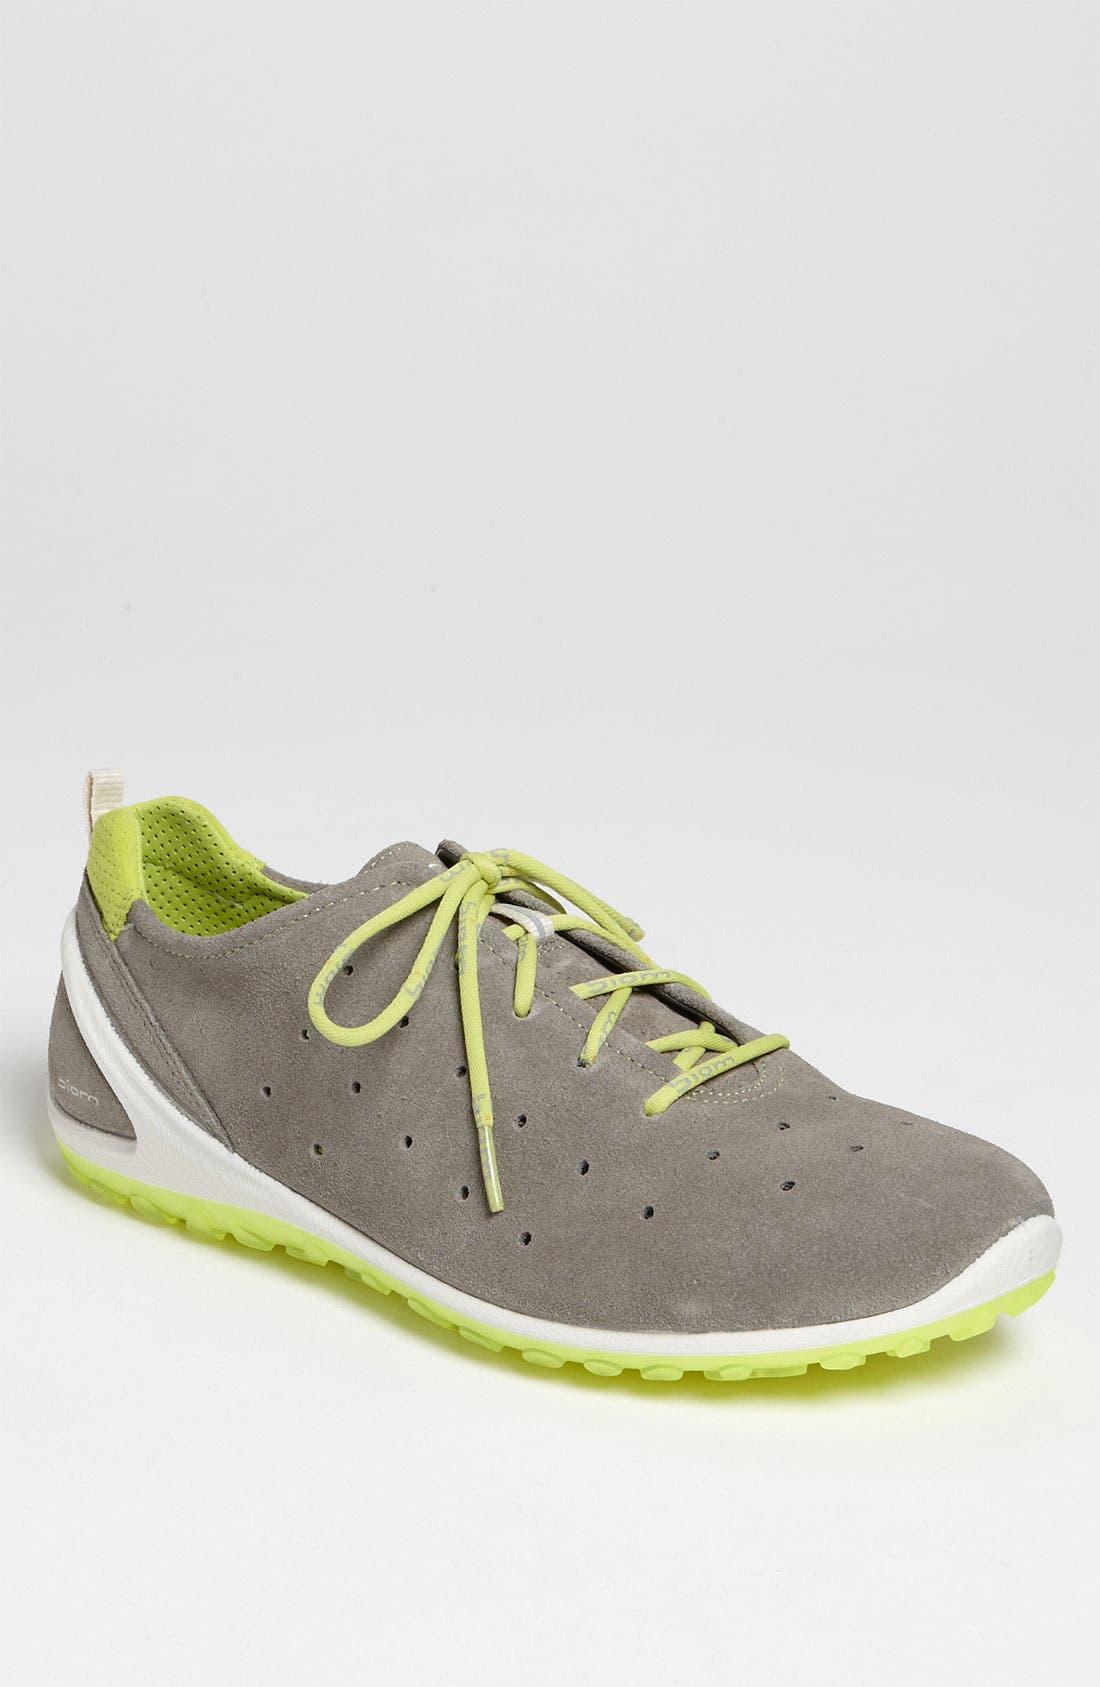 Main Image - ECCO 'Biom Lite 1.2' Training Shoe (Men)